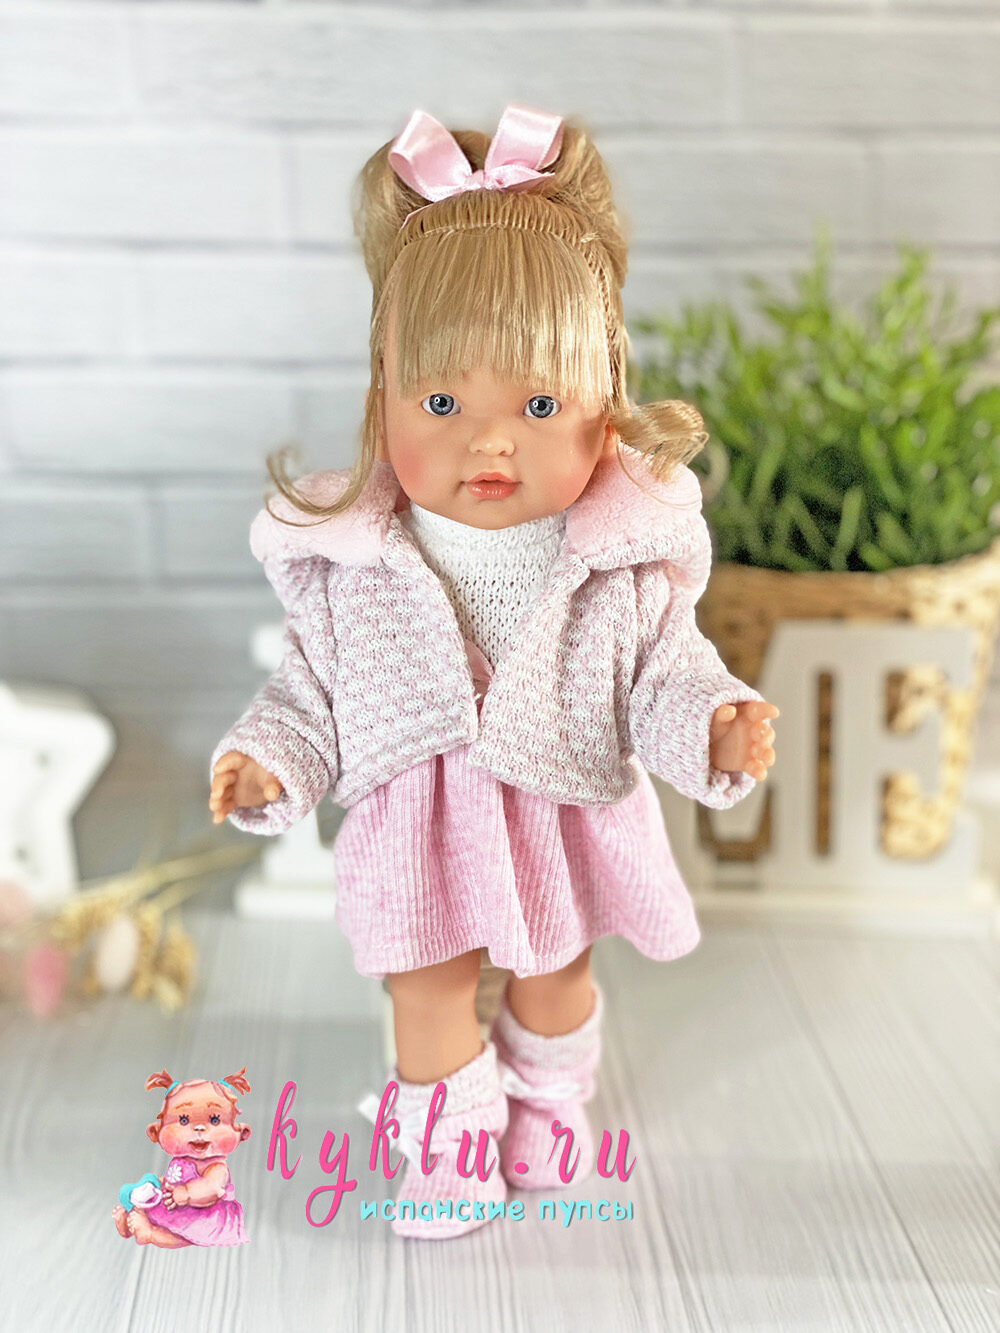 Кукла Валерия от фабрики Llorens